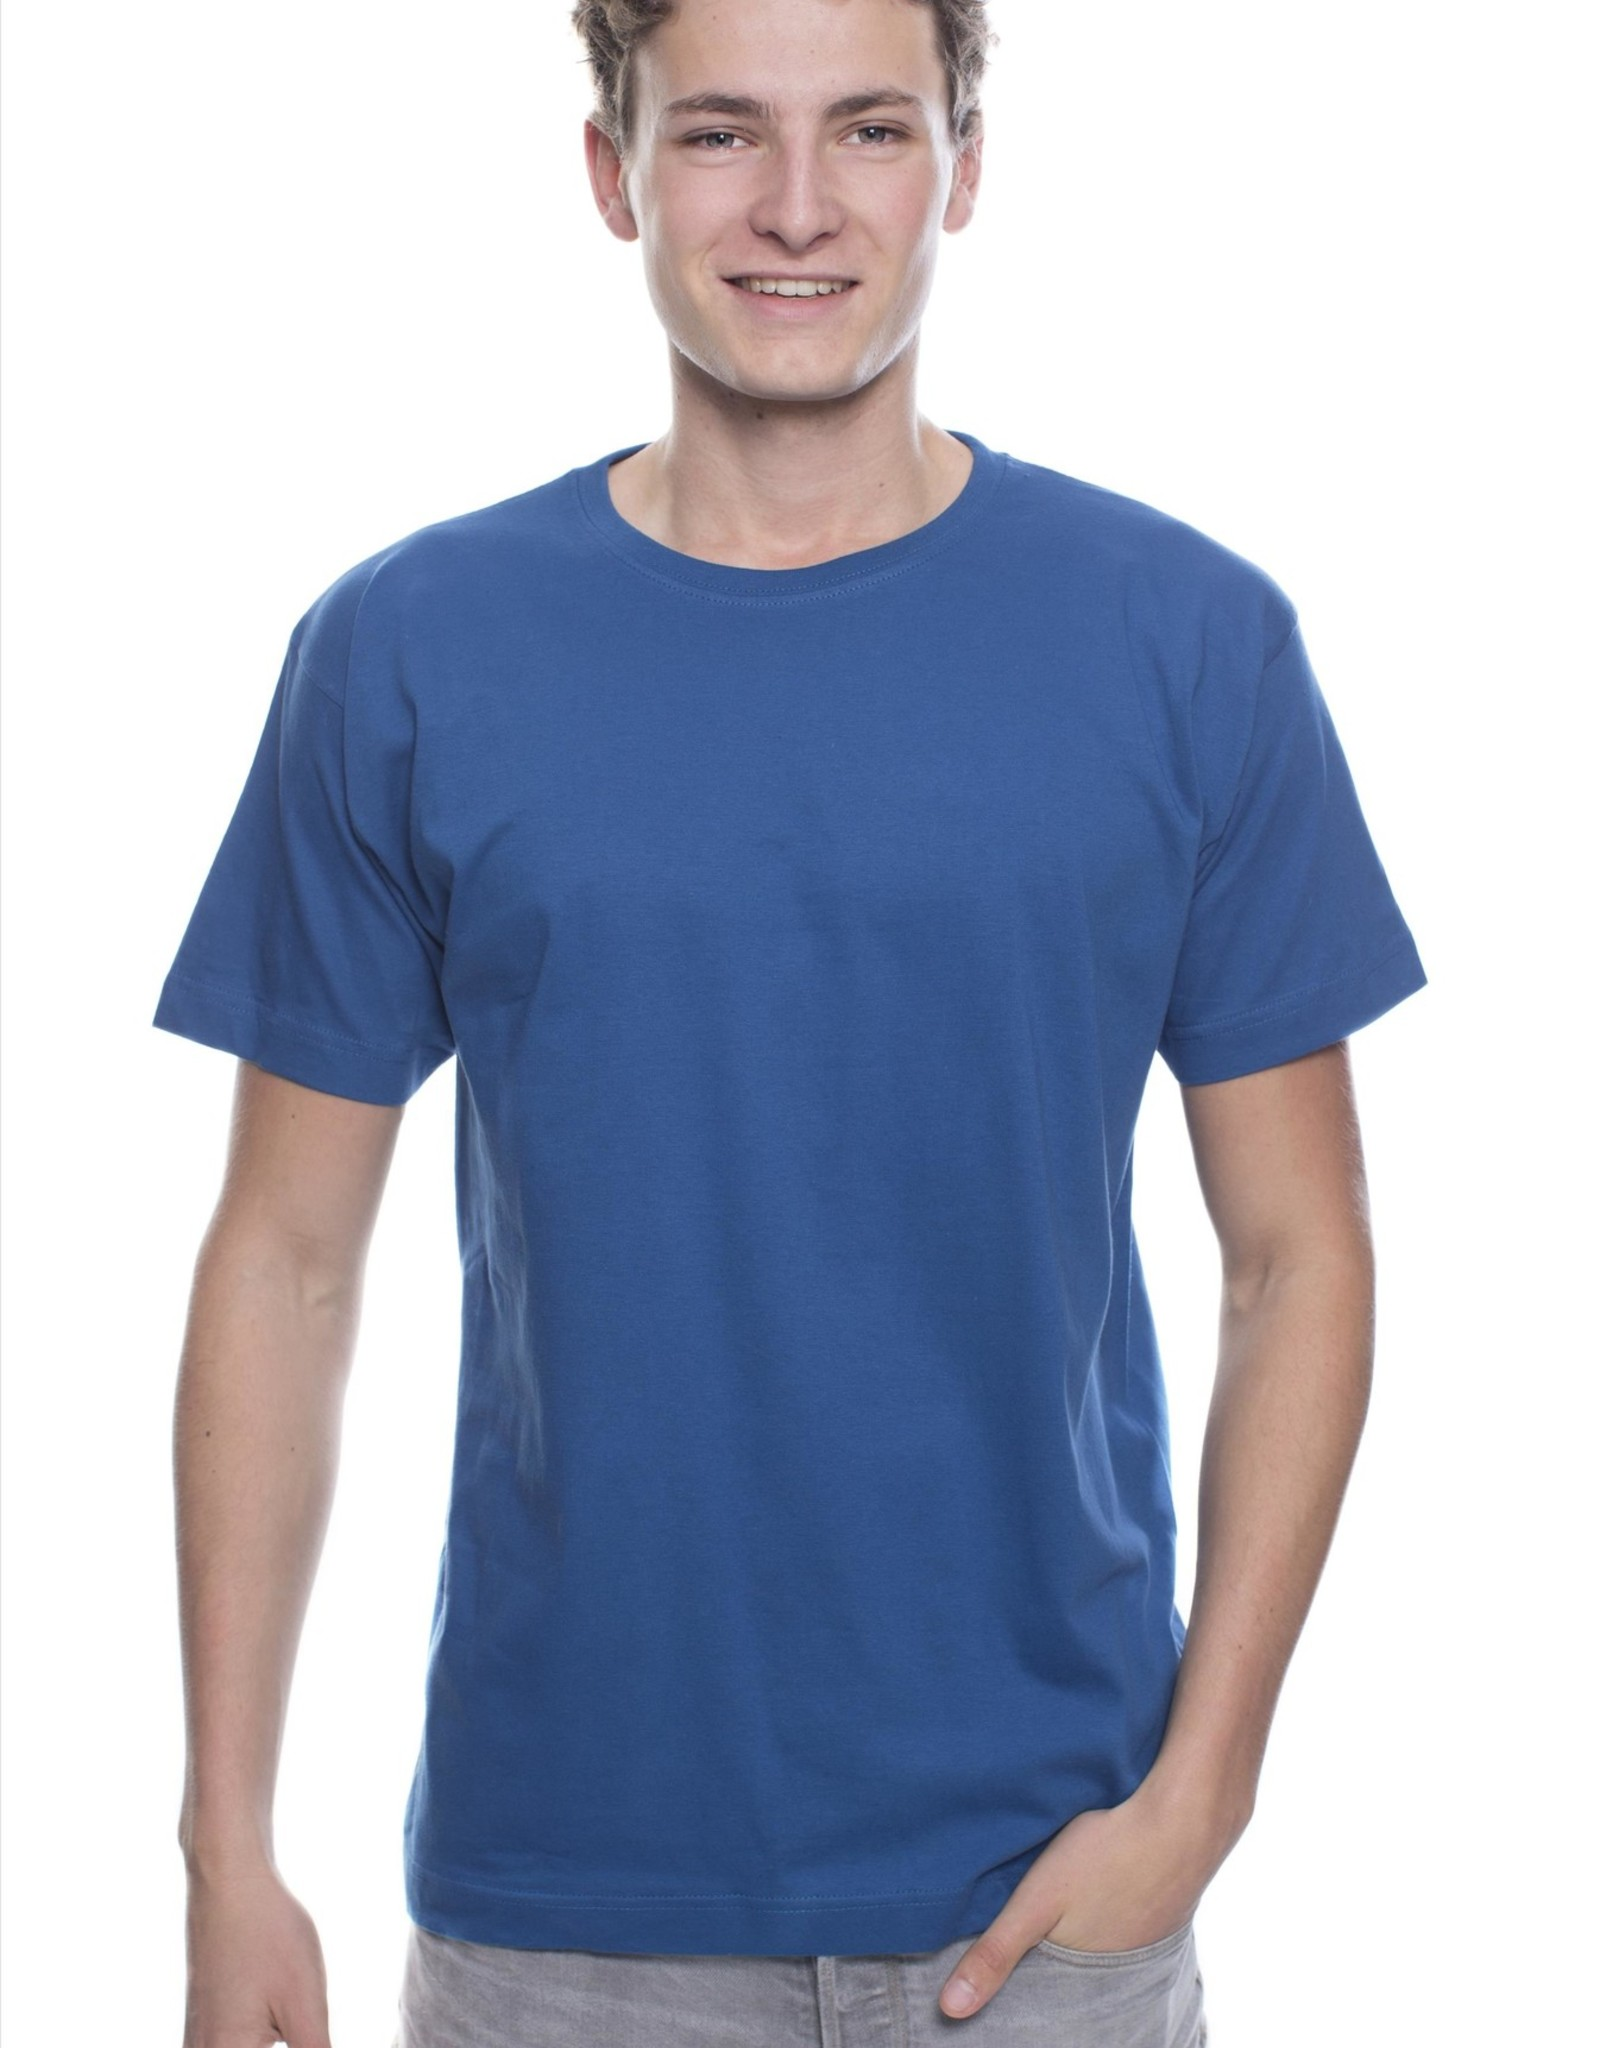 Logostar T-SHIRT basic met ronde hals navy